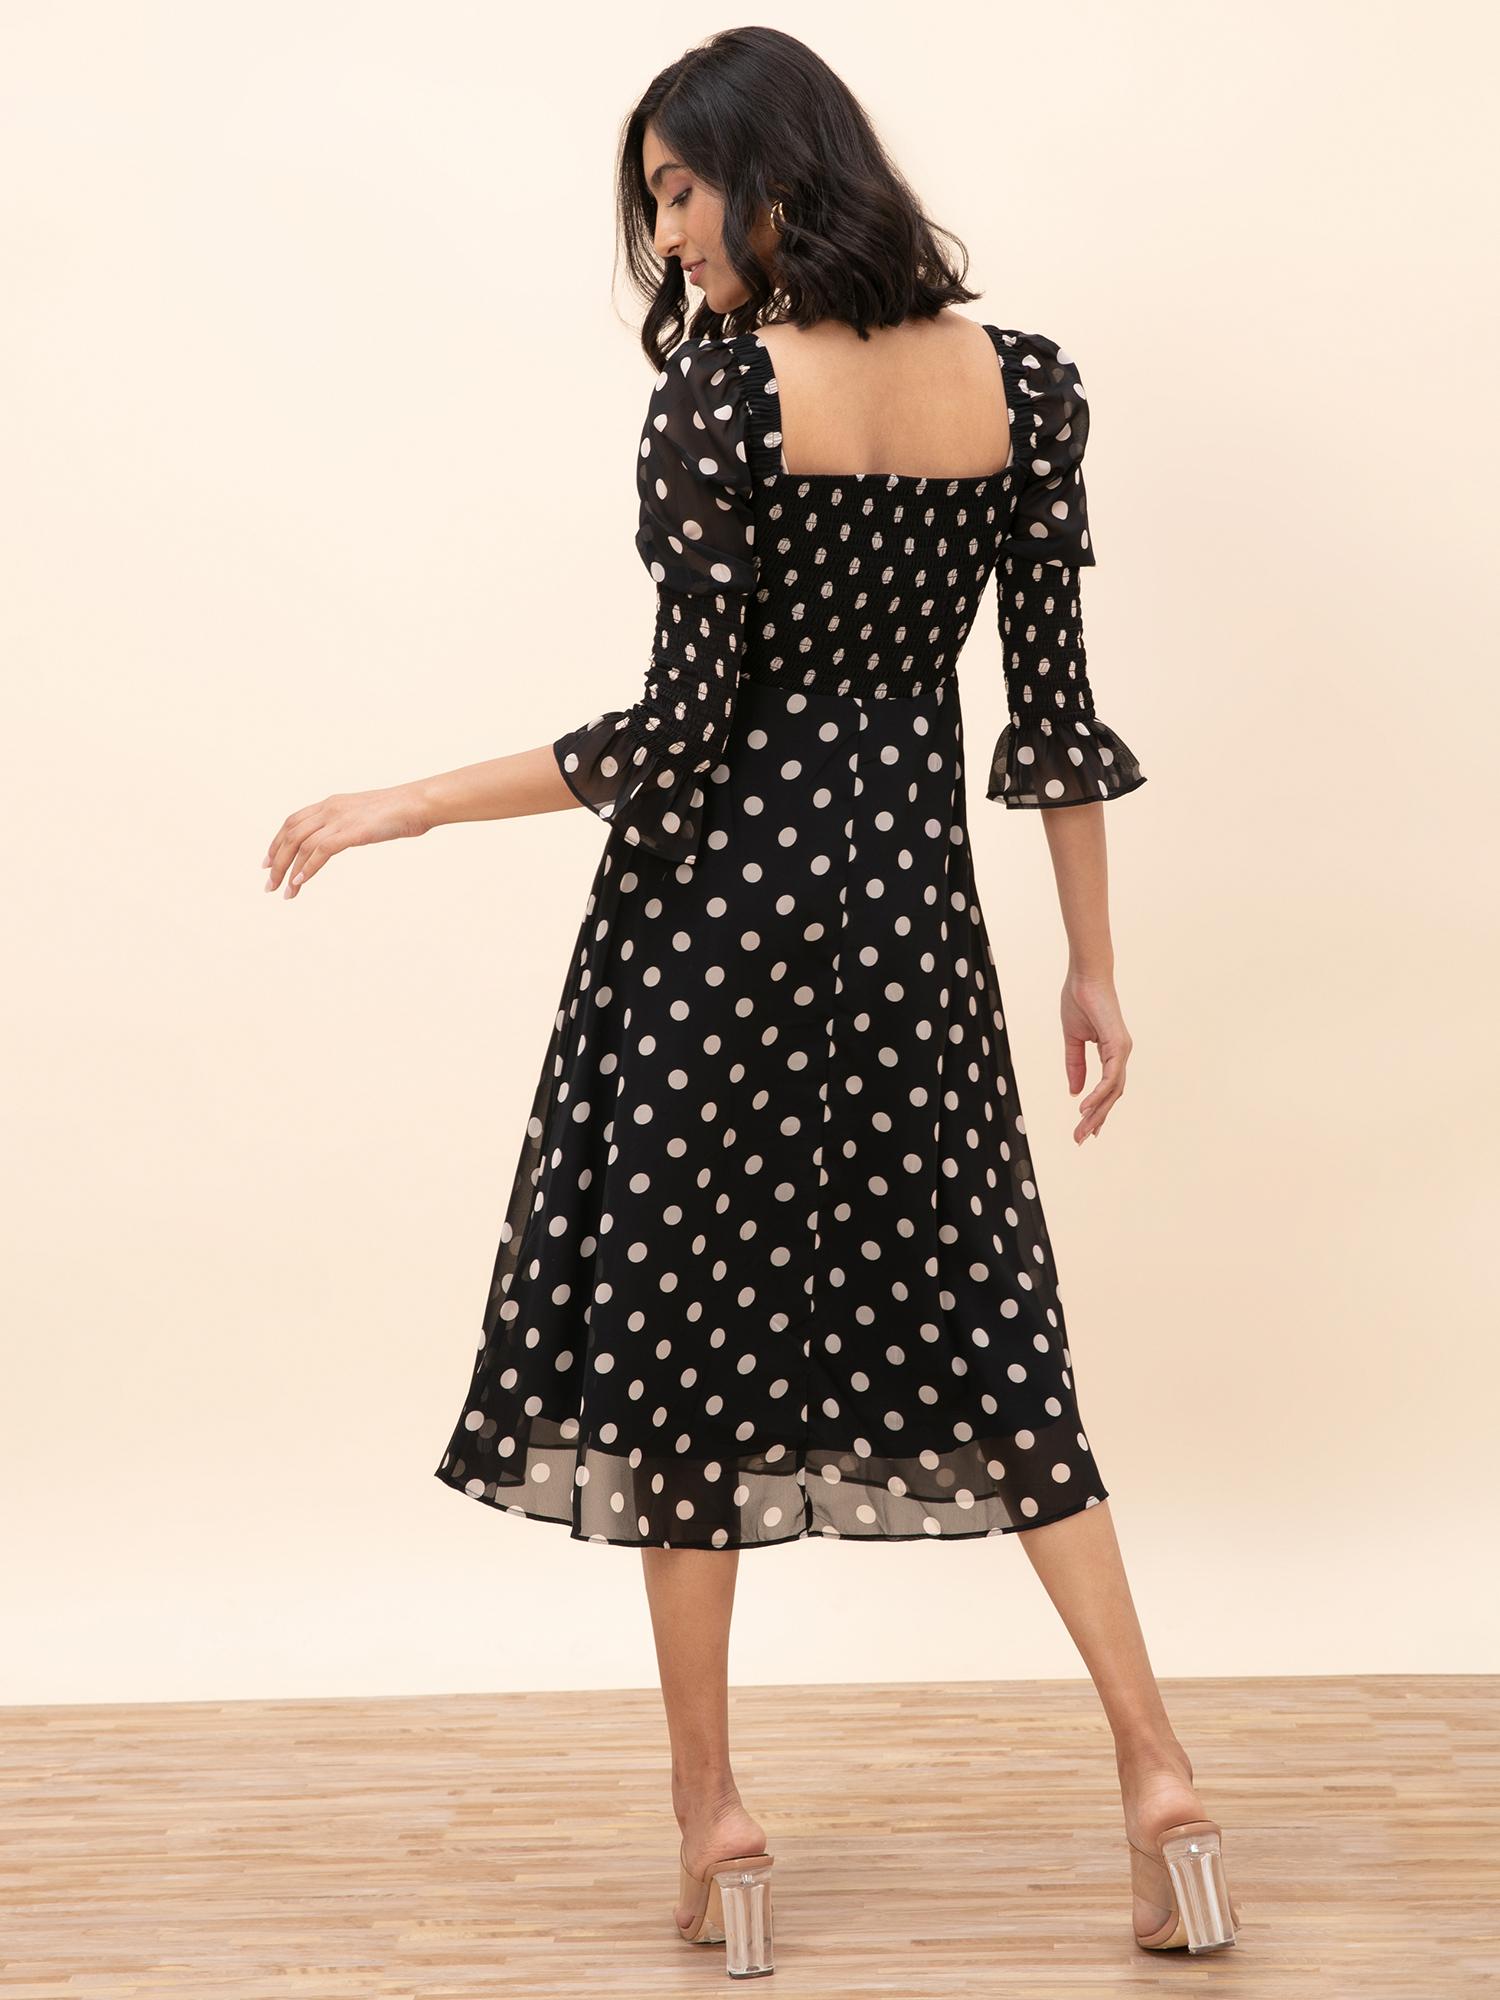 Dresses-Slipping Into Polka Midi Dress3